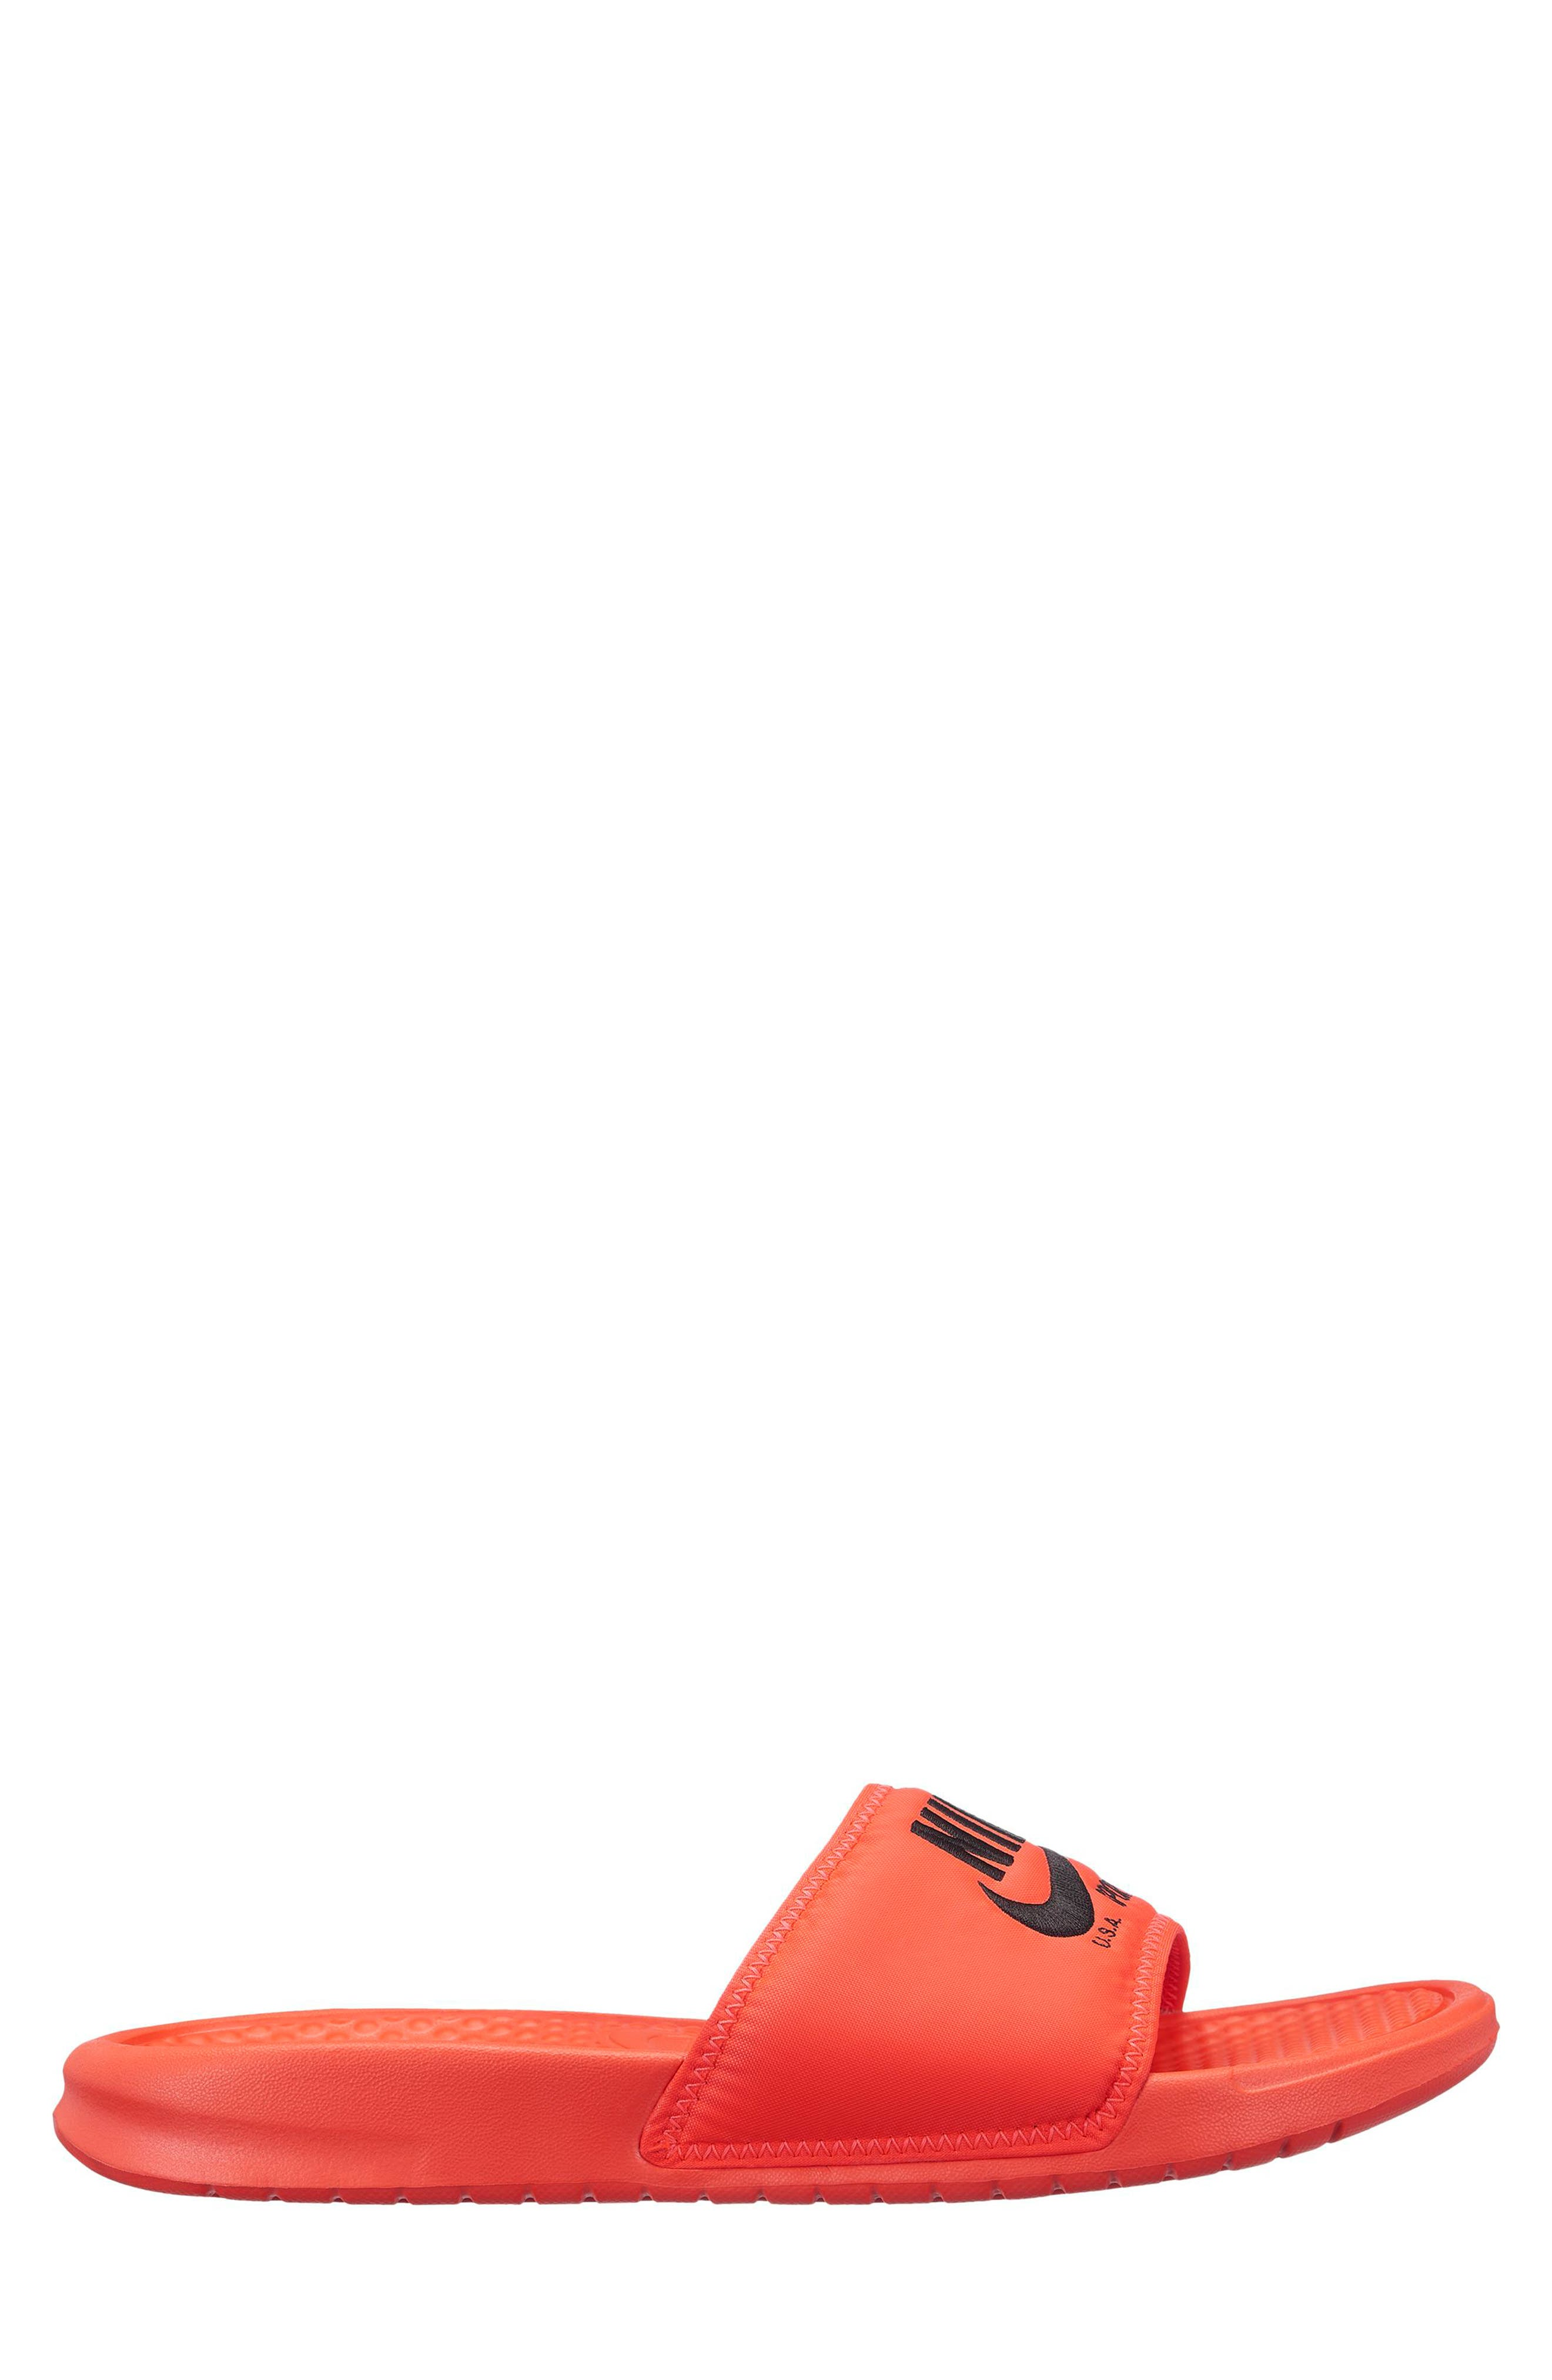 Benassi JDI Slide Sandal,                             Alternate thumbnail 2, color,                             BRIGHT CRIMSON/ BLACK